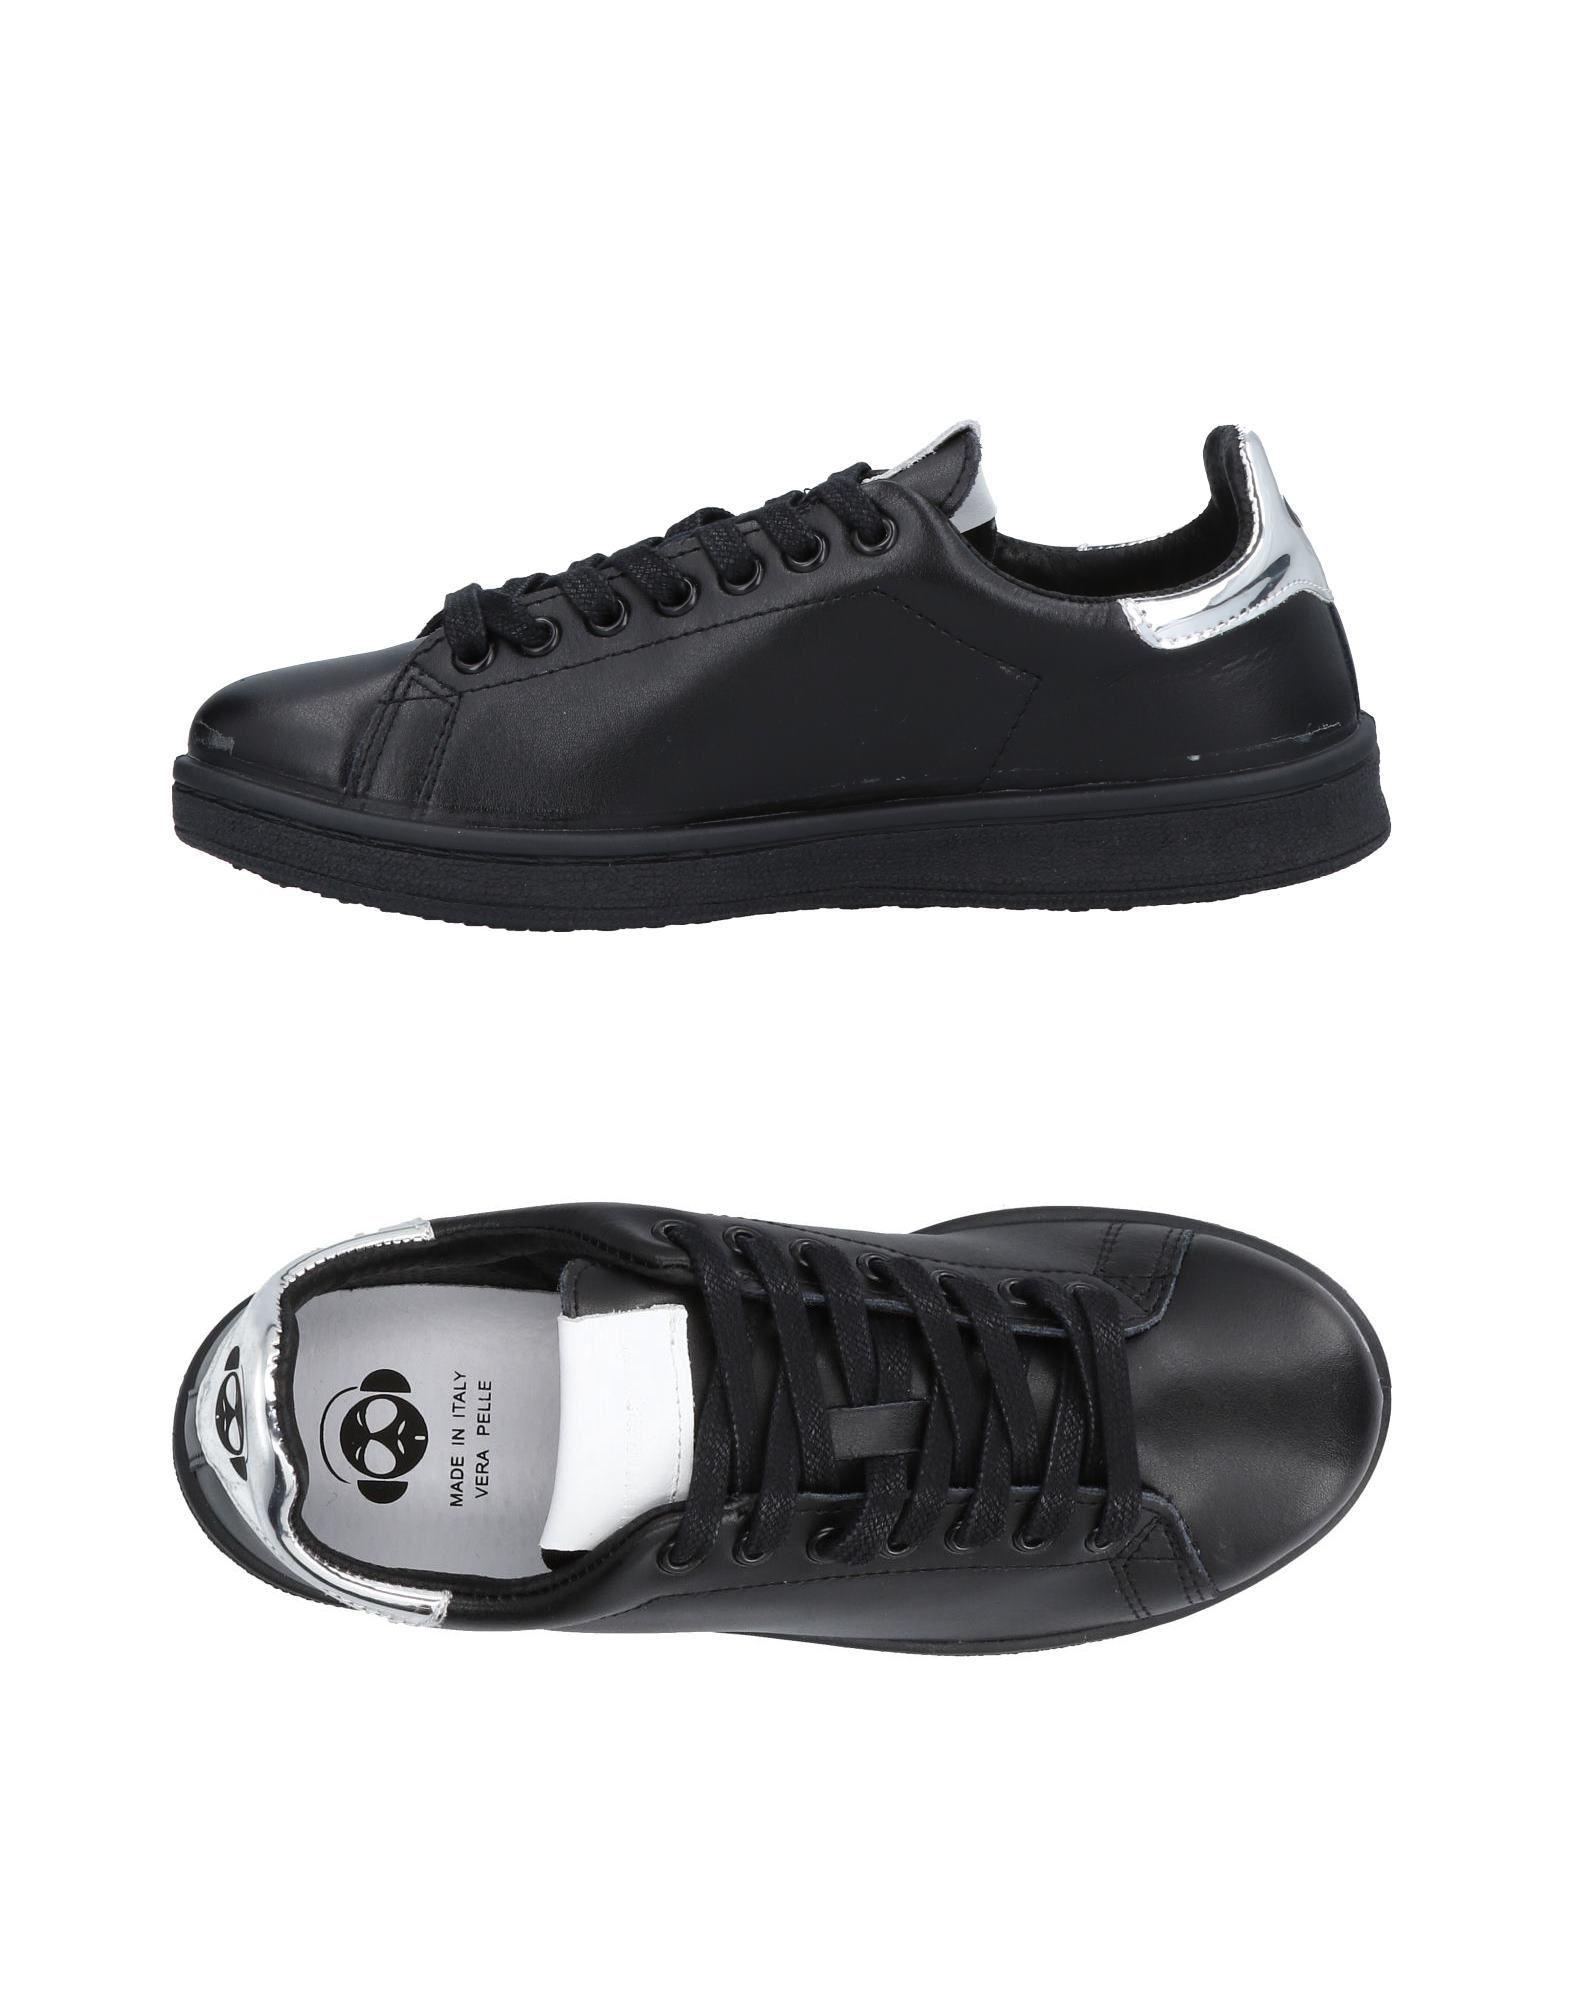 Effetti Personali Sneakers Damen  11467609CX Gute Qualität beliebte Schuhe